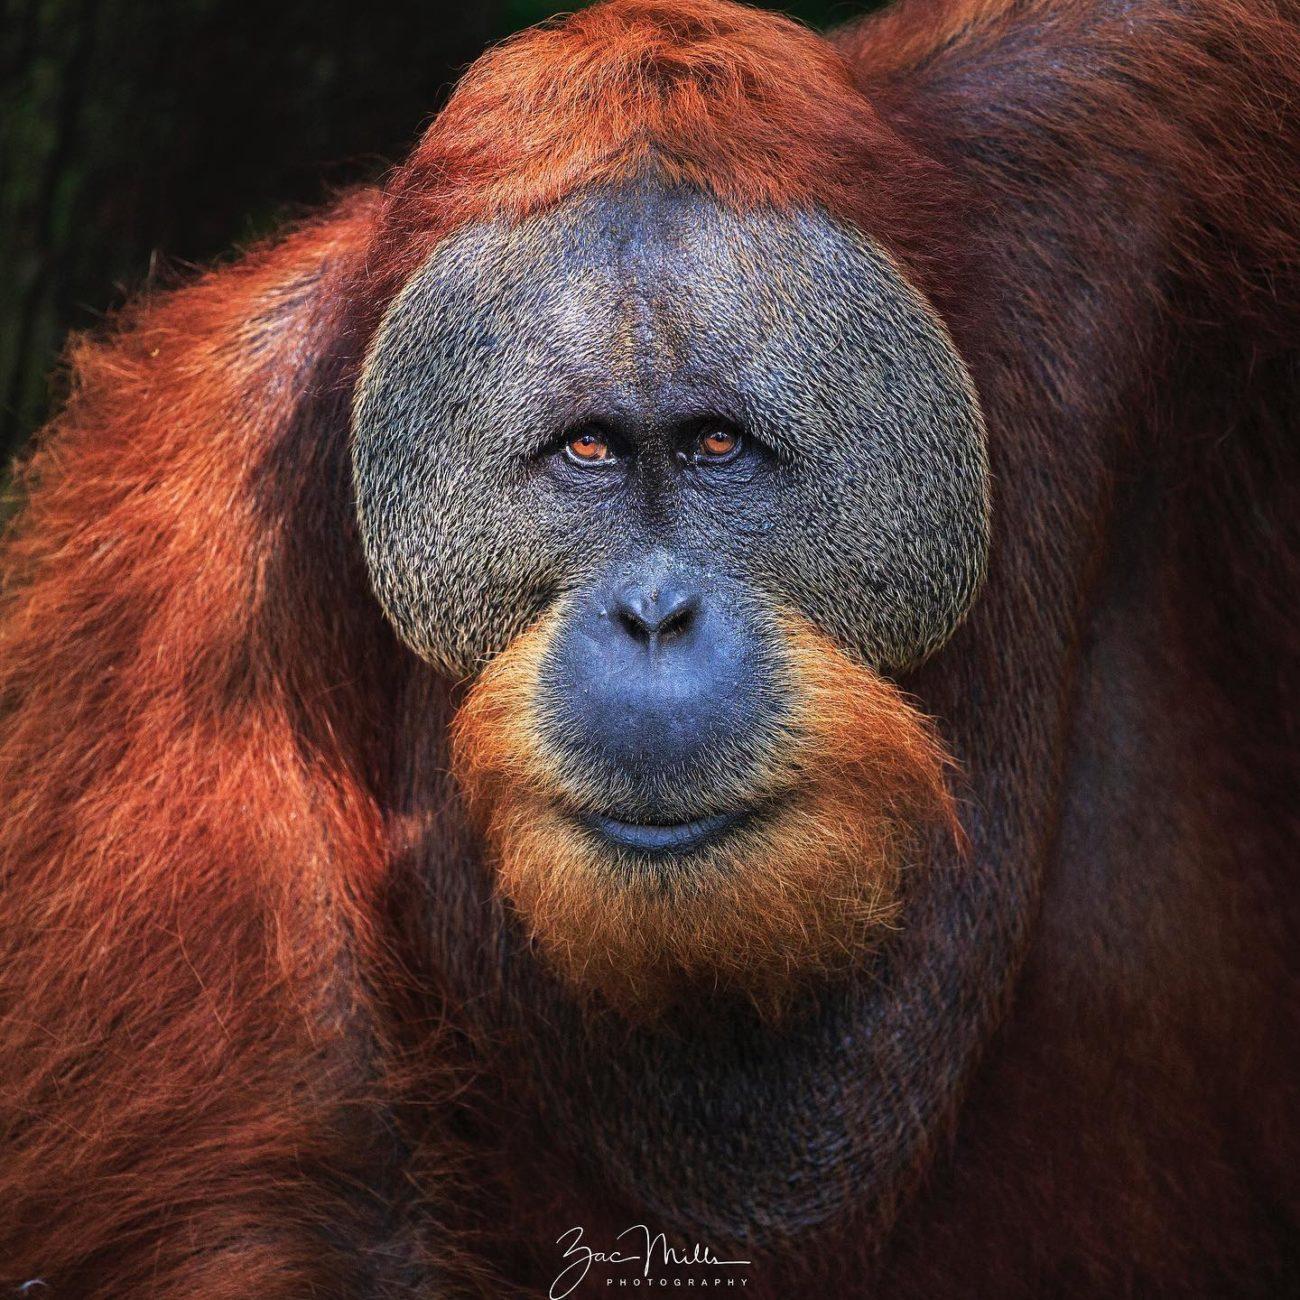 A male orangutan